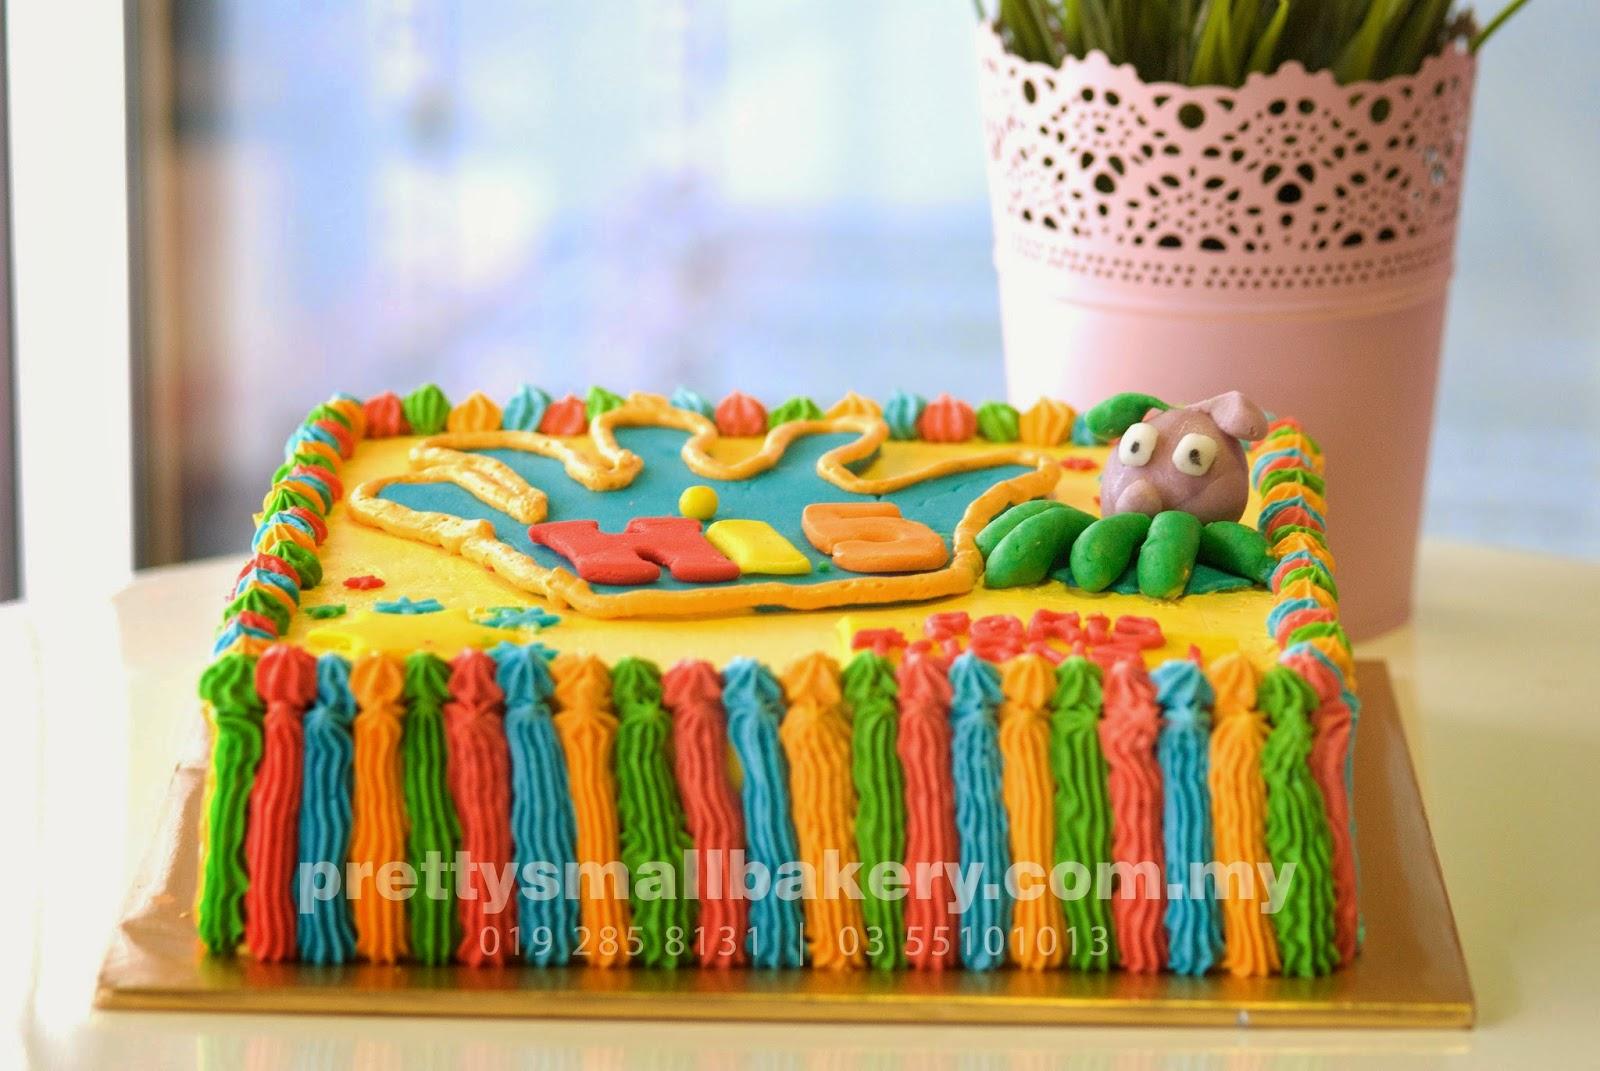 Kek Hari Jadi Hi 5 Prettysmallbakery